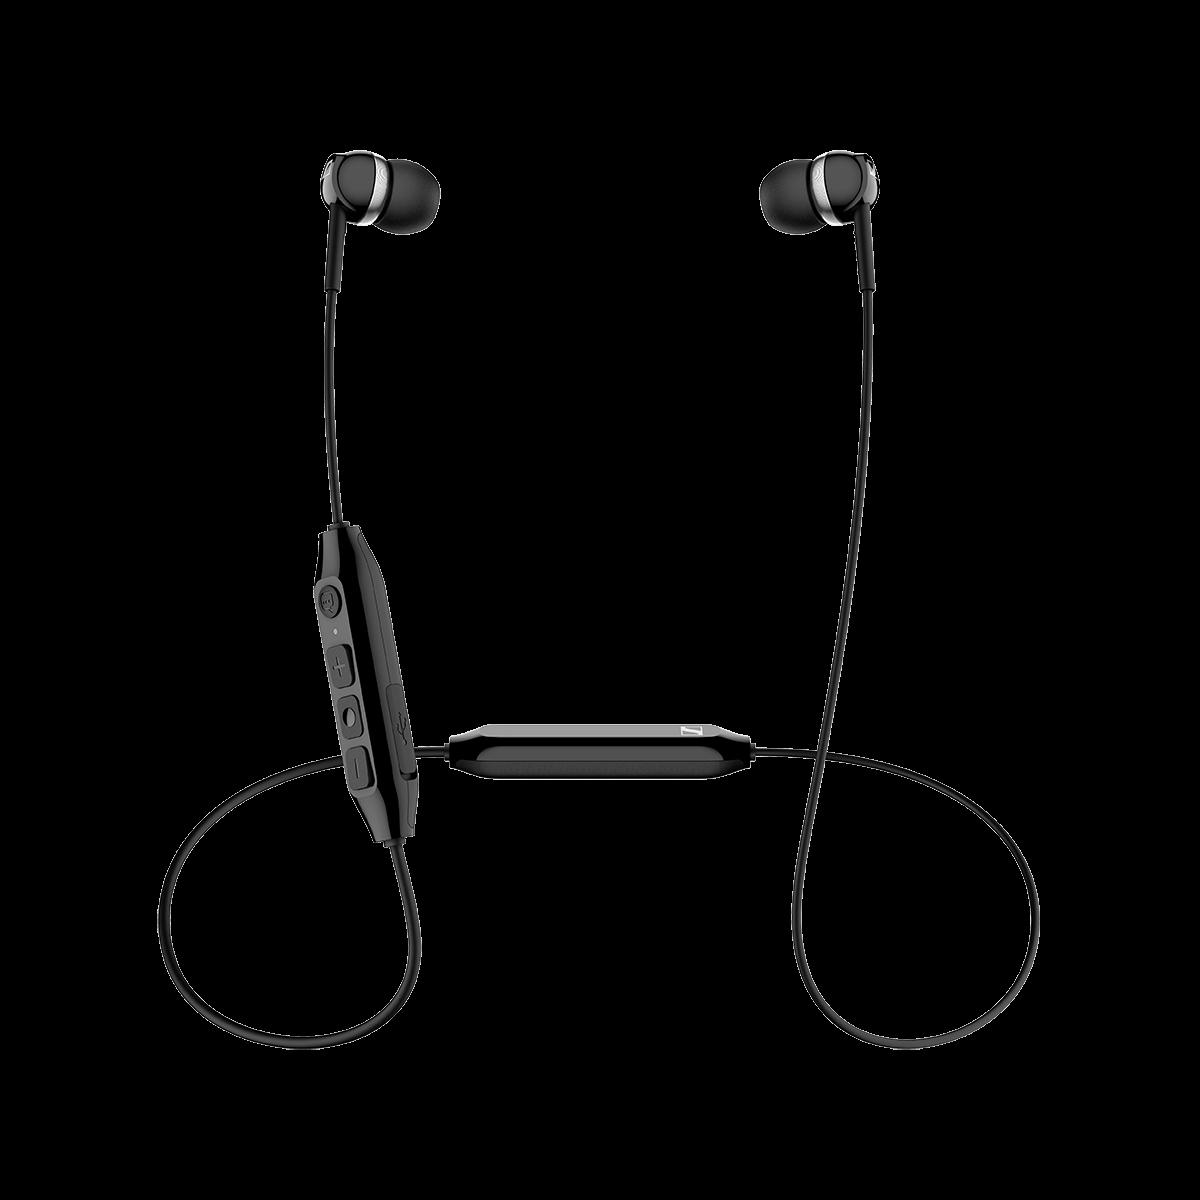 Sennheiser CX 350 BT (Black)